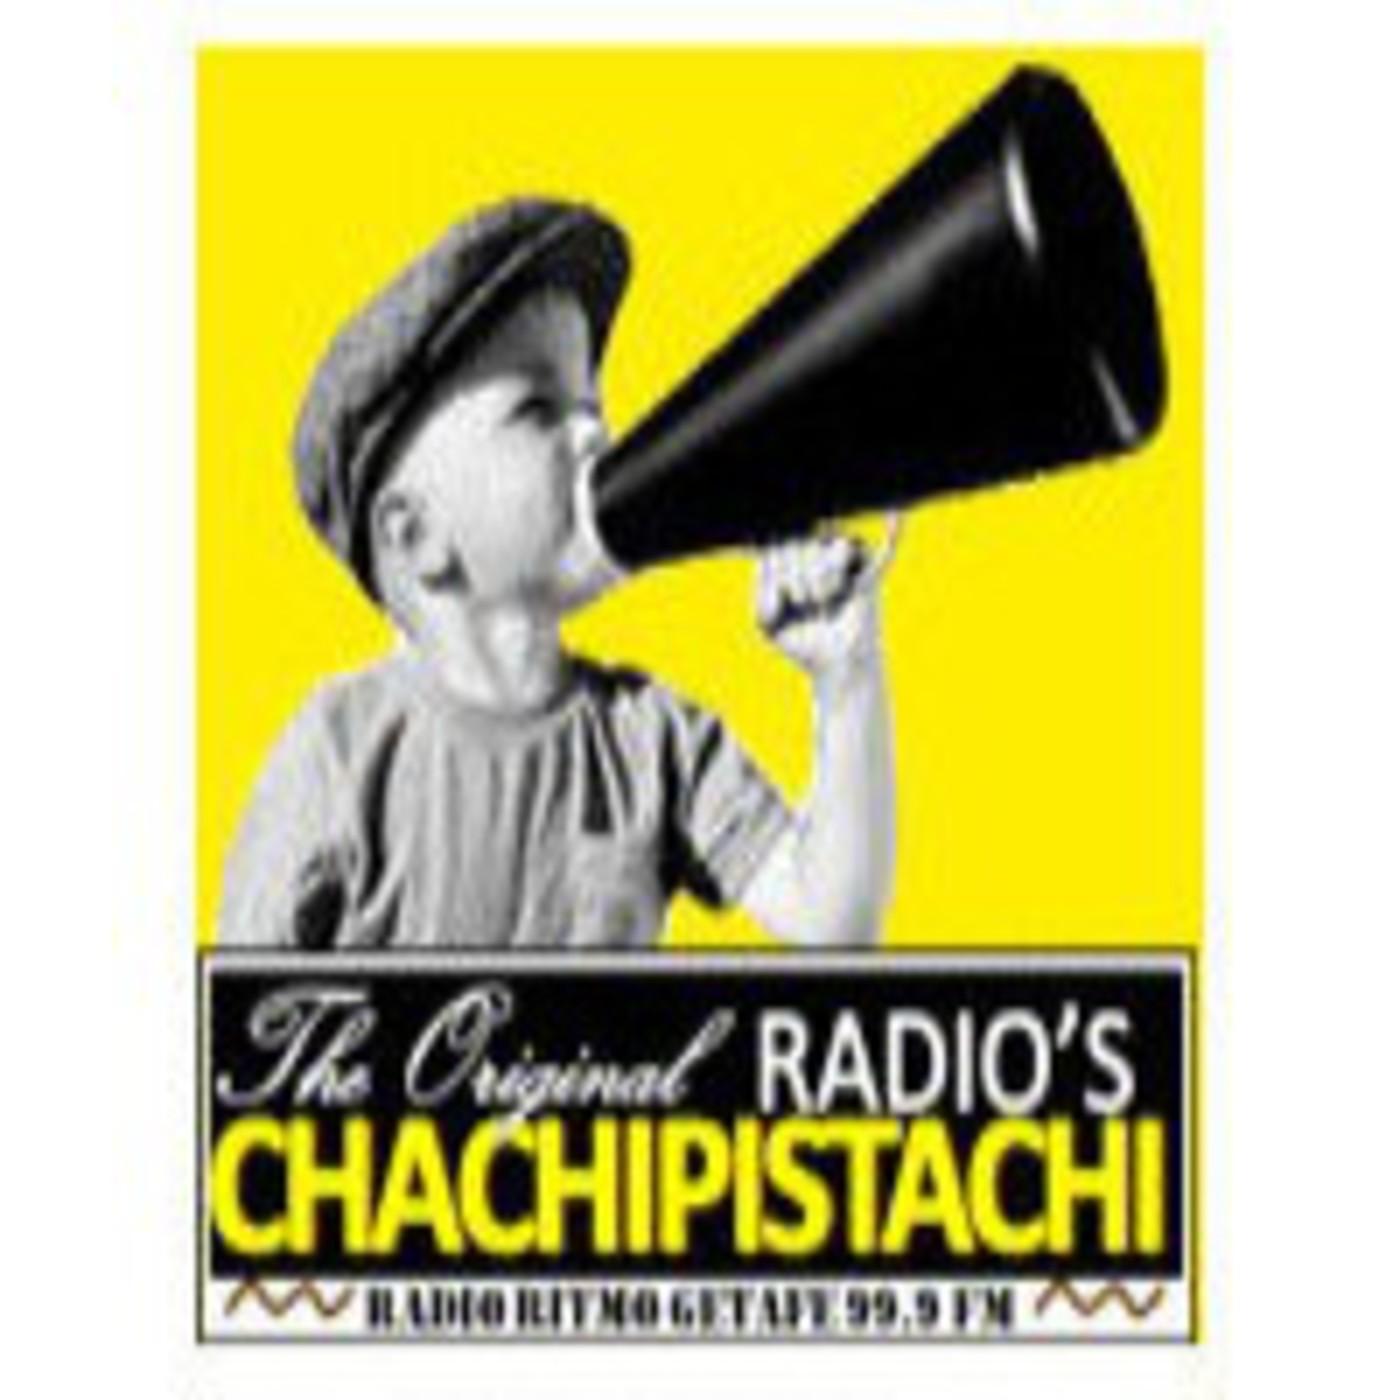 Chachipistachi 28.4.11